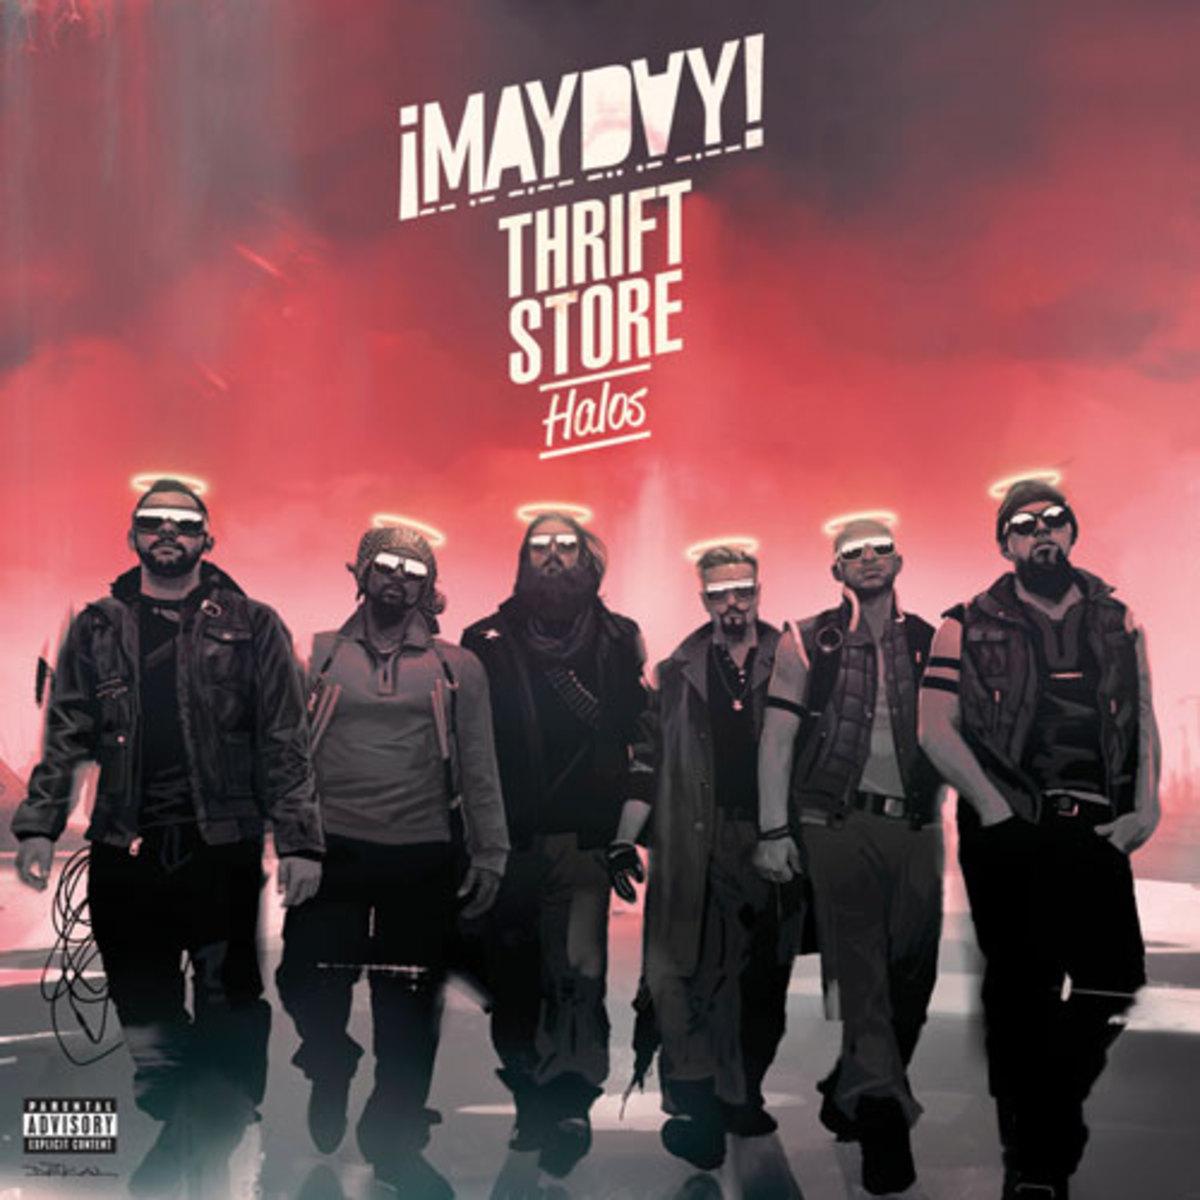 mayday-thriftstorehalos.jpg